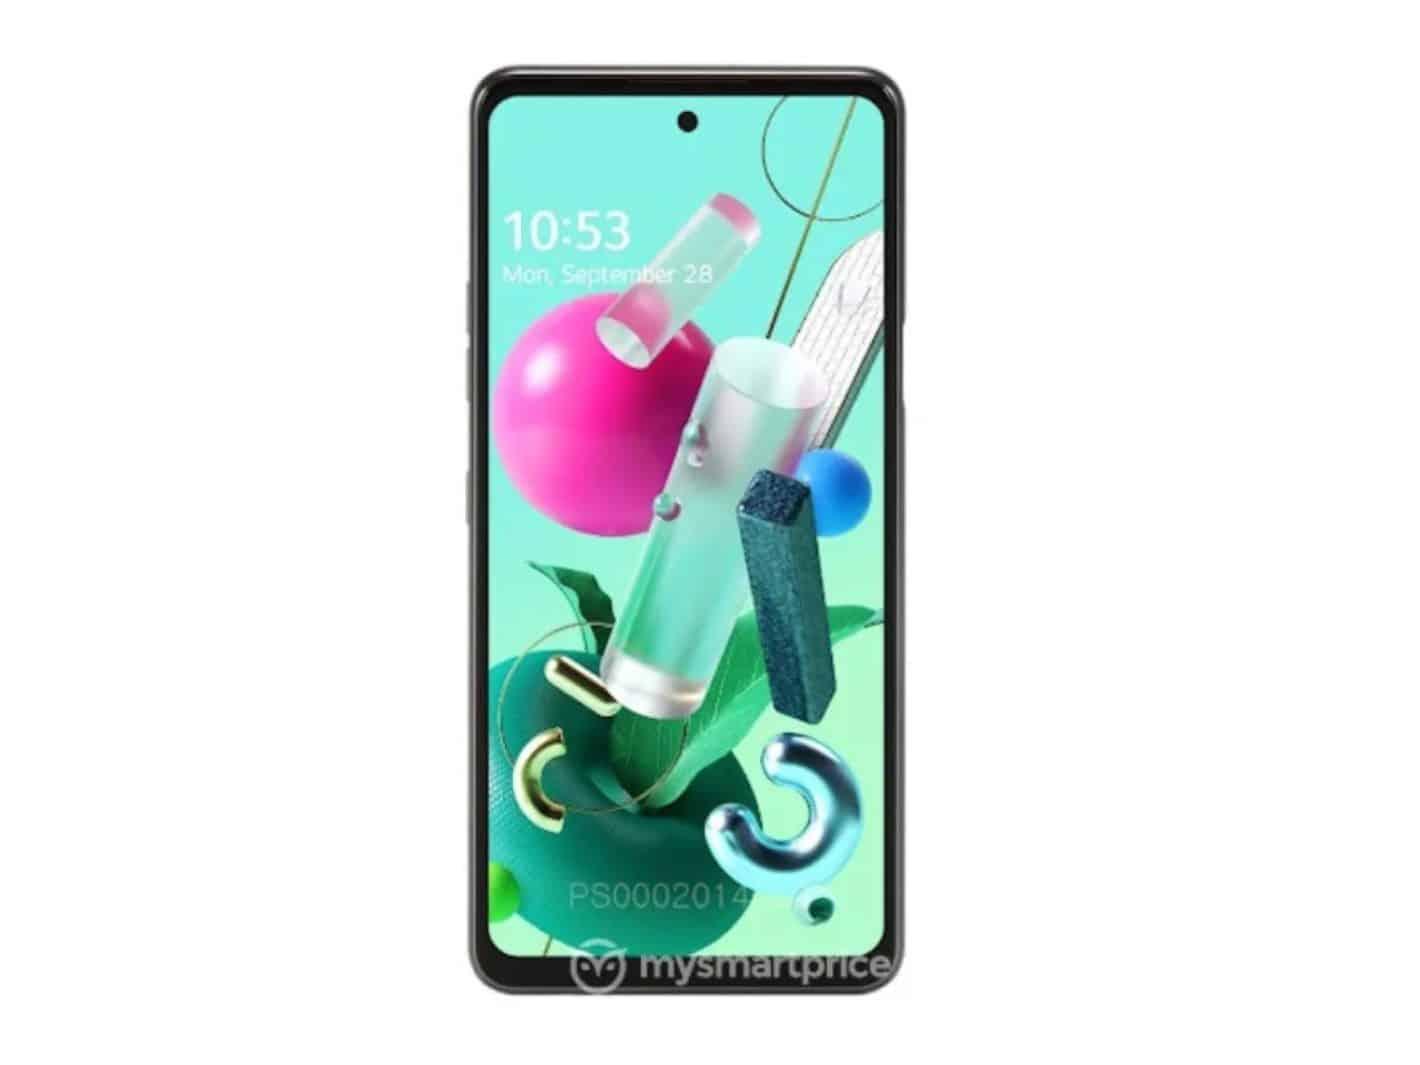 LG Q92 5G Leak from mysmartprice via google play console